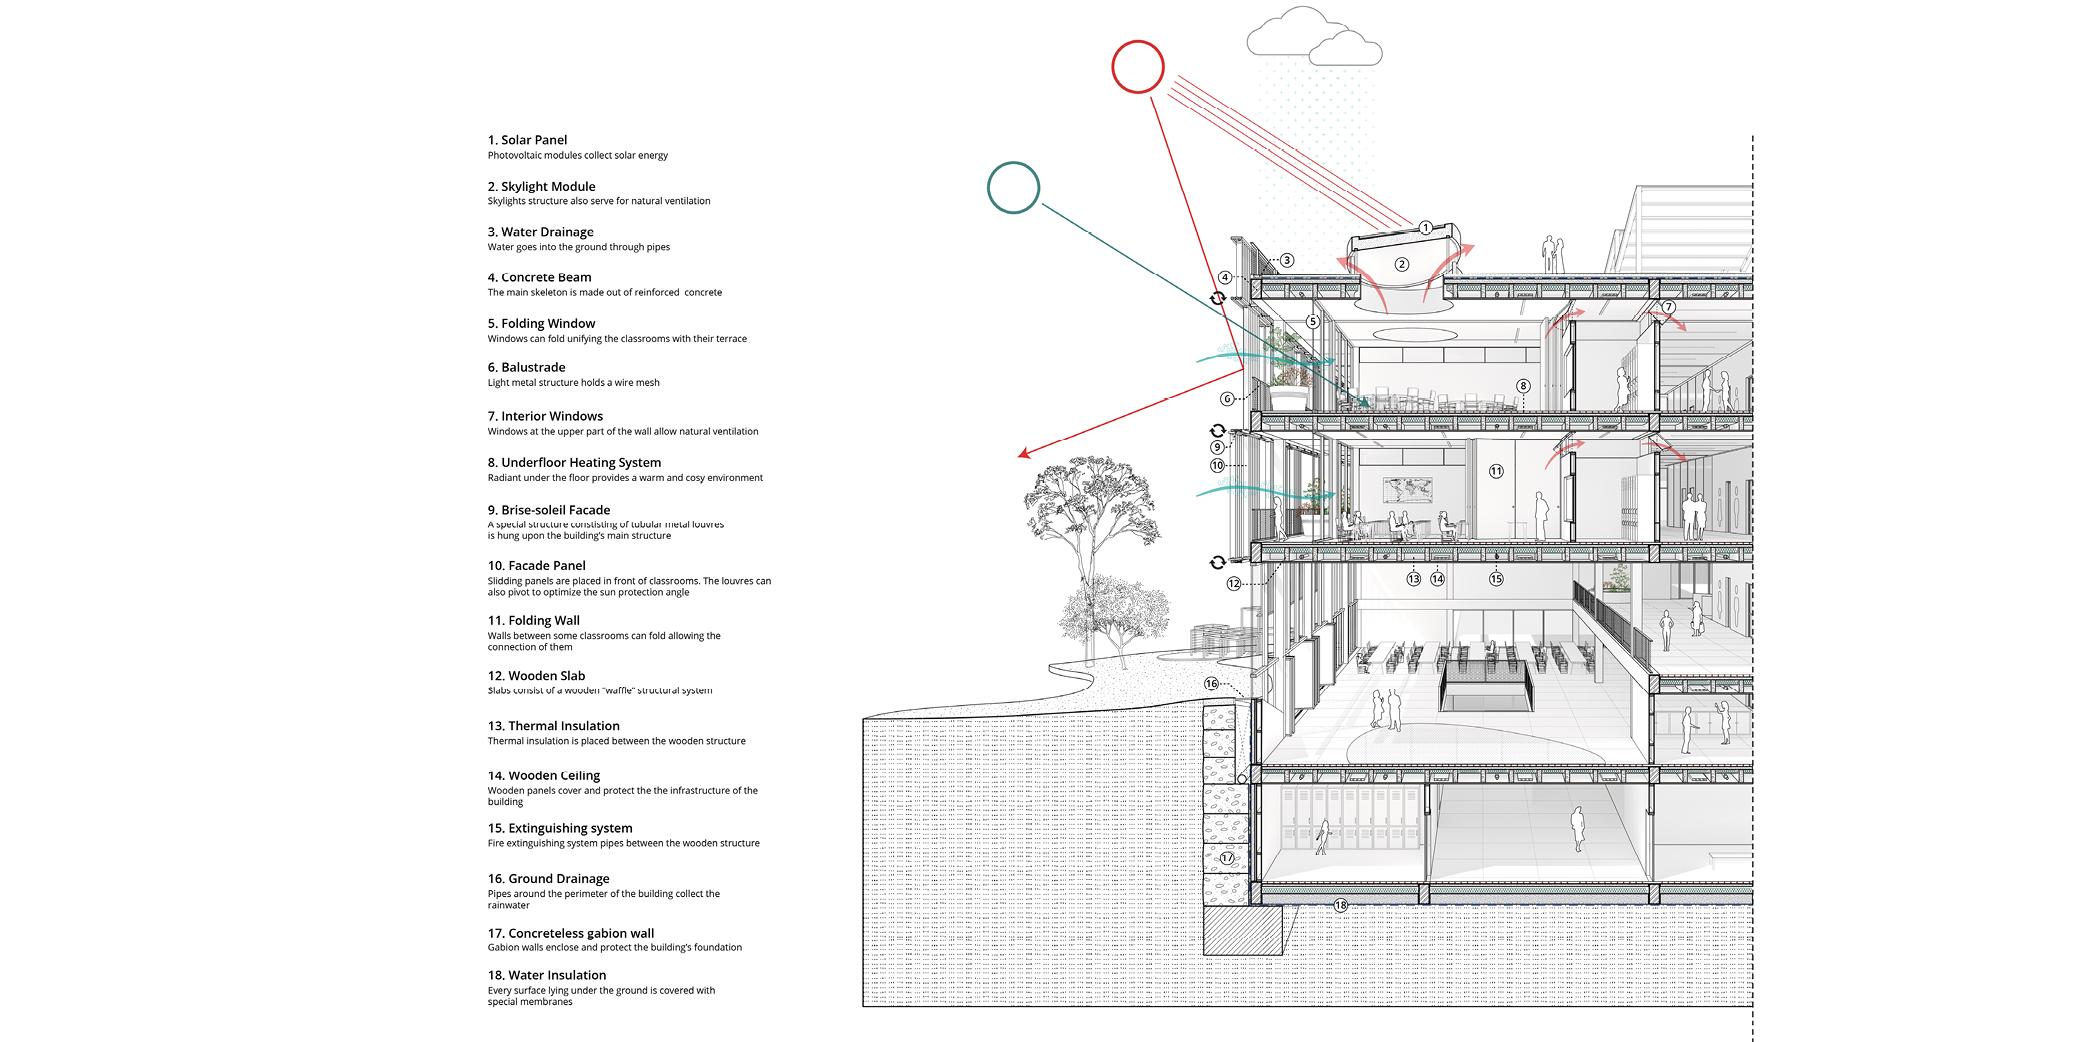 OCA architects New Elementary School and Kindergarten for - Nová ZS a MS pro - Dolní Měcholupy Hernan Lleida Ruiz Bernardo Garcia Morales16